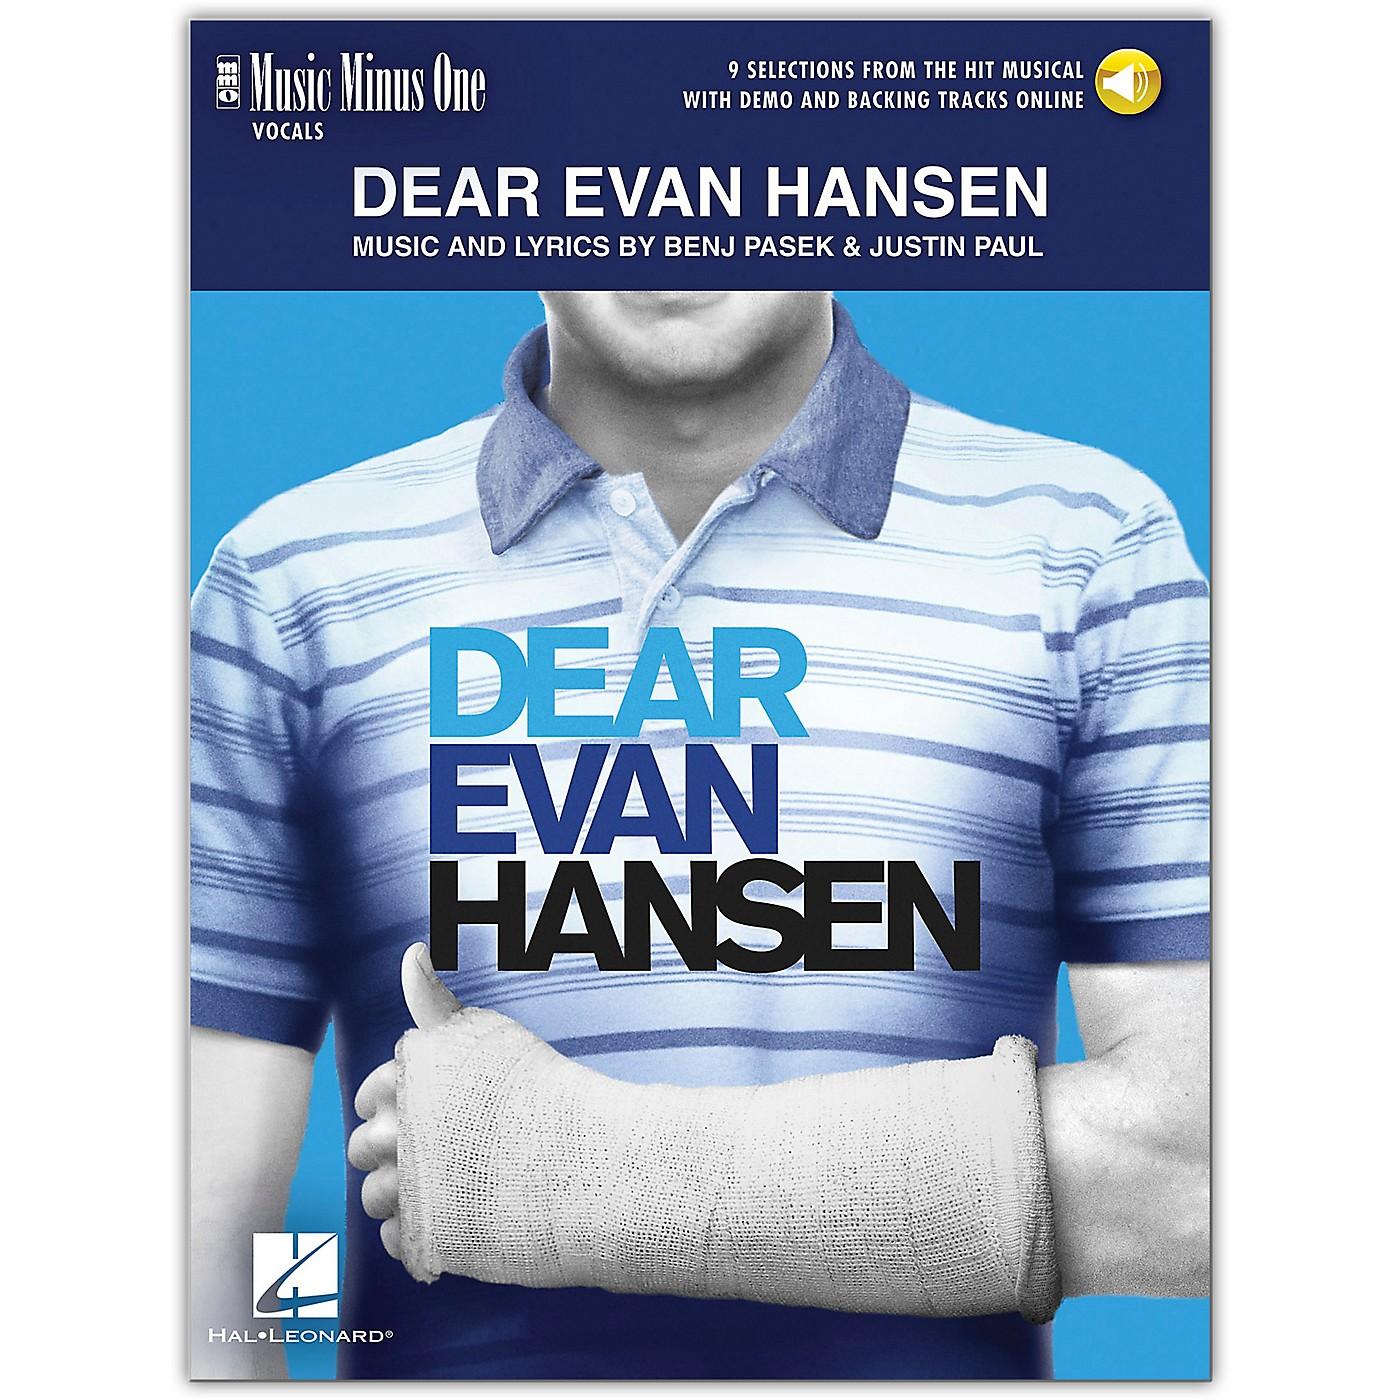 Hal Leonard Dear Evan Hansen - Music Minus One Vocals (Book/Audio Online) 9 Selections From Musical thumbnail